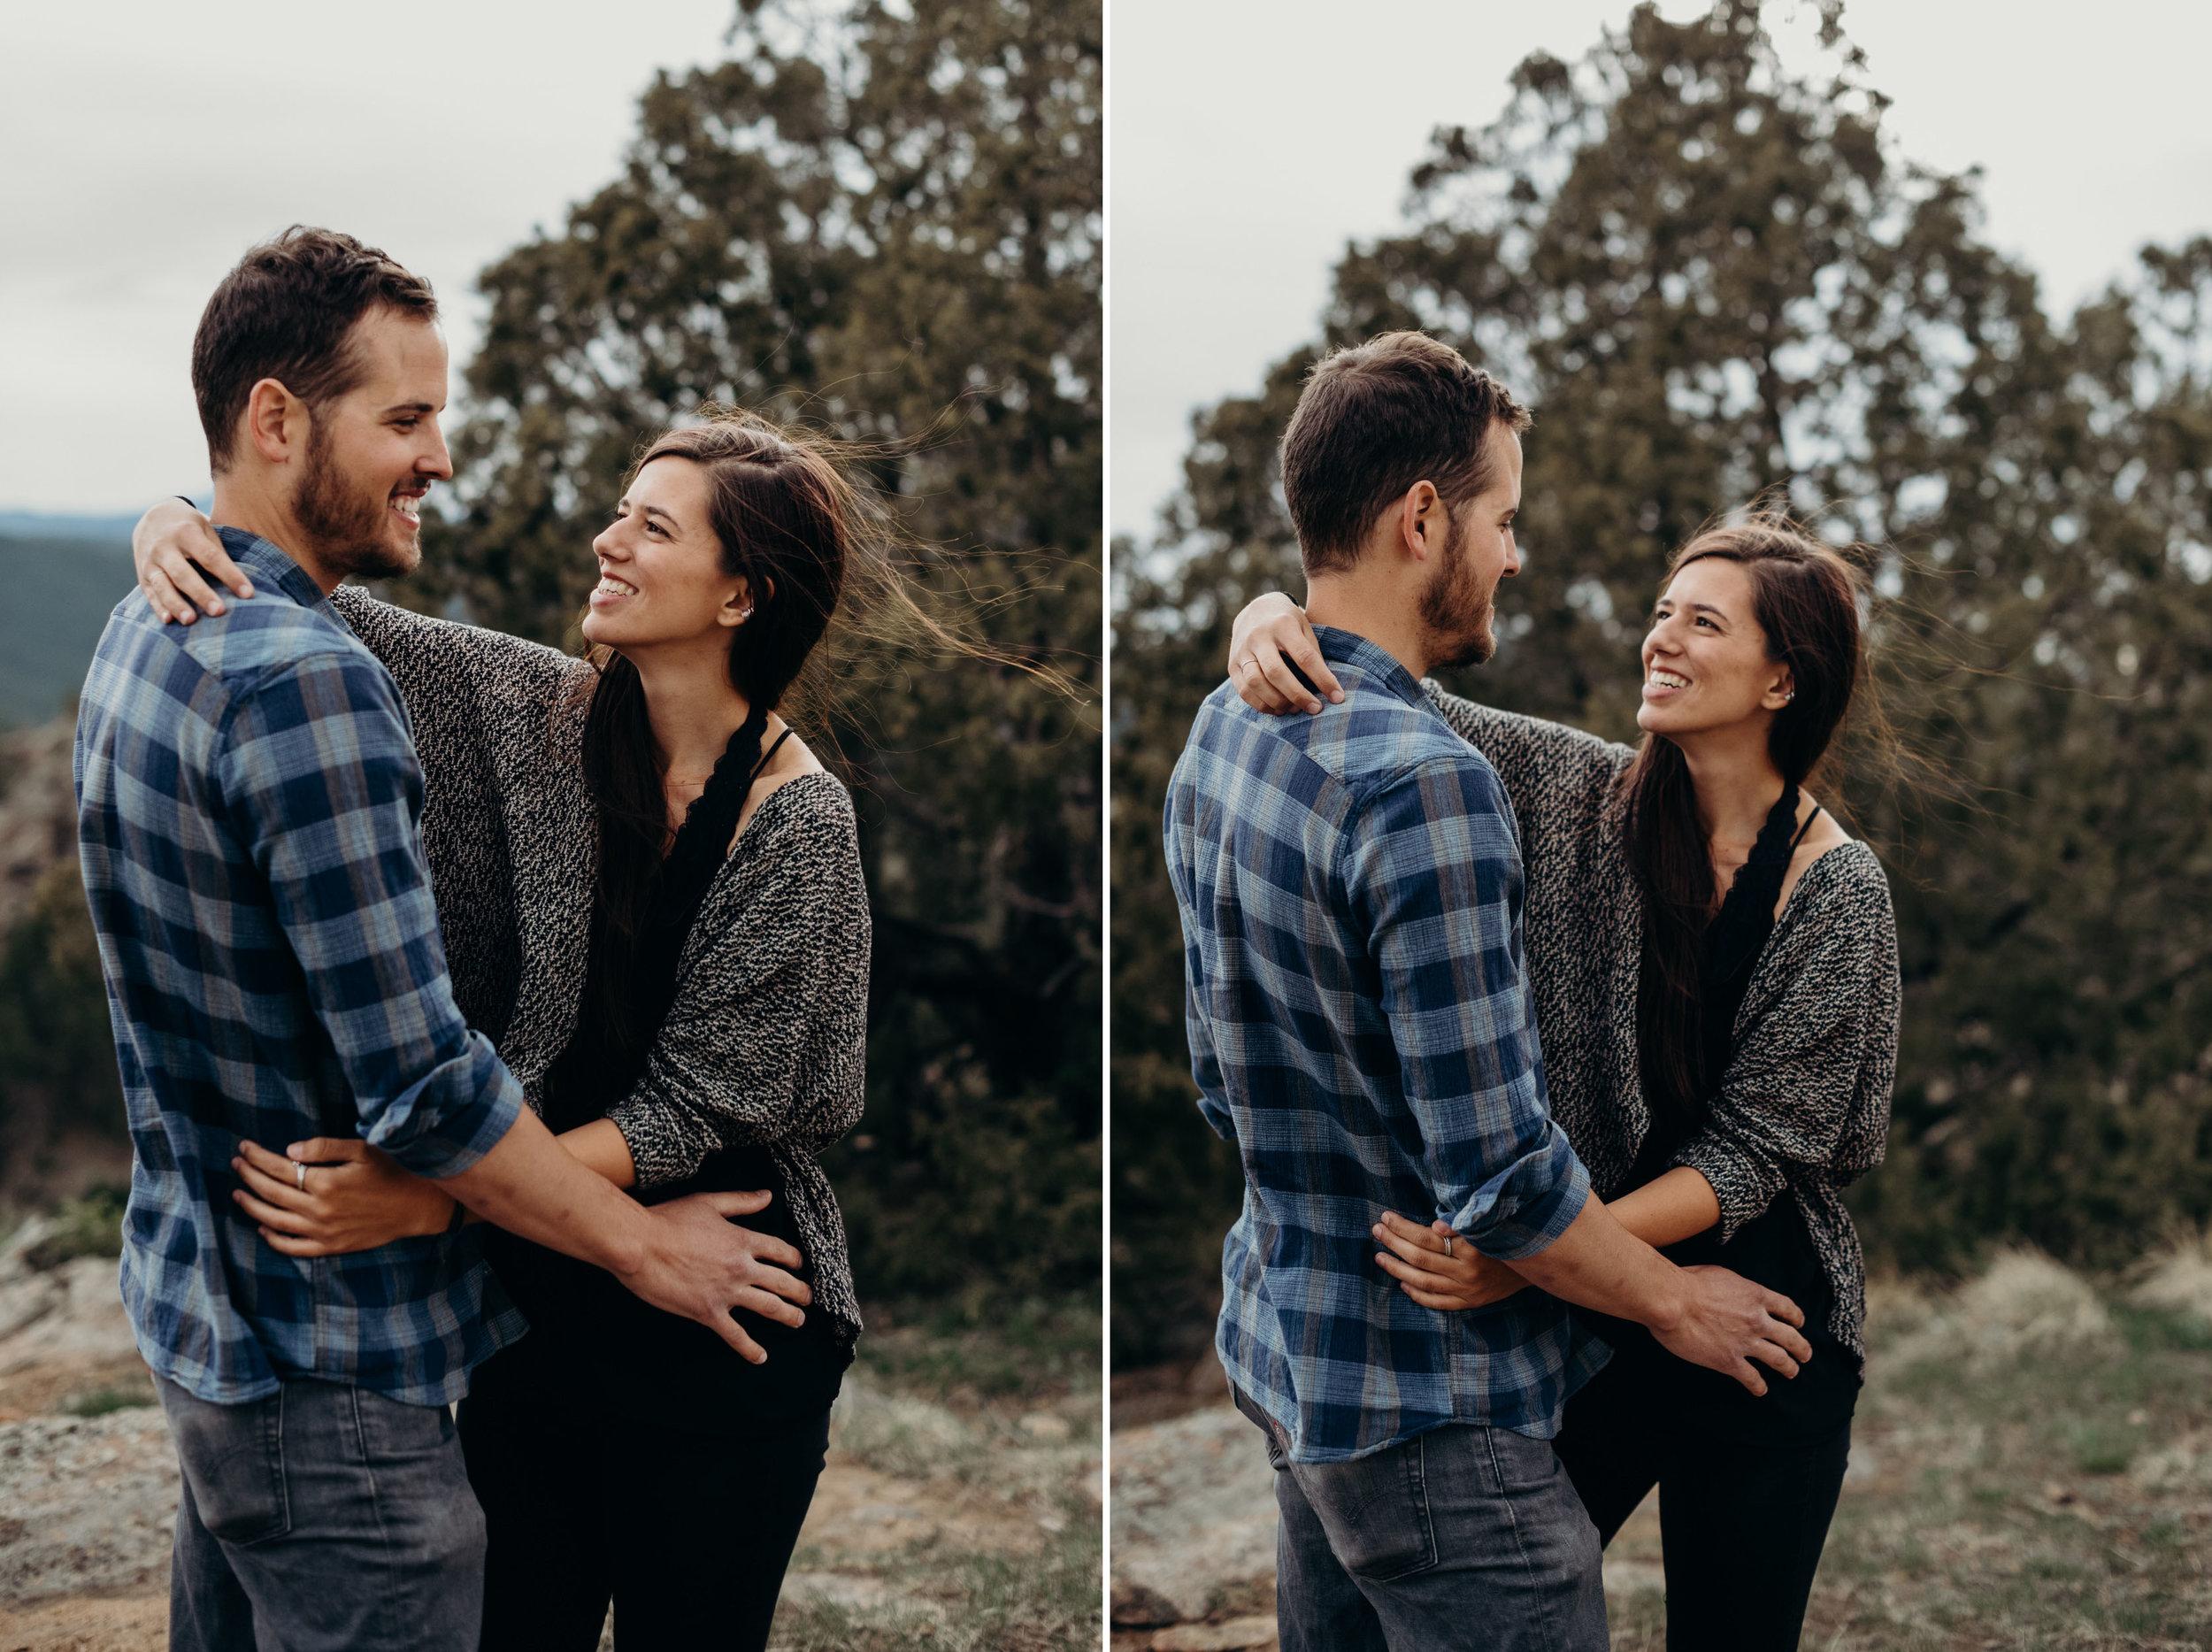 Denver-Colorado-Mt-Falcon-Engagement-Megan-Graham-Photography-Blog-3.jpg